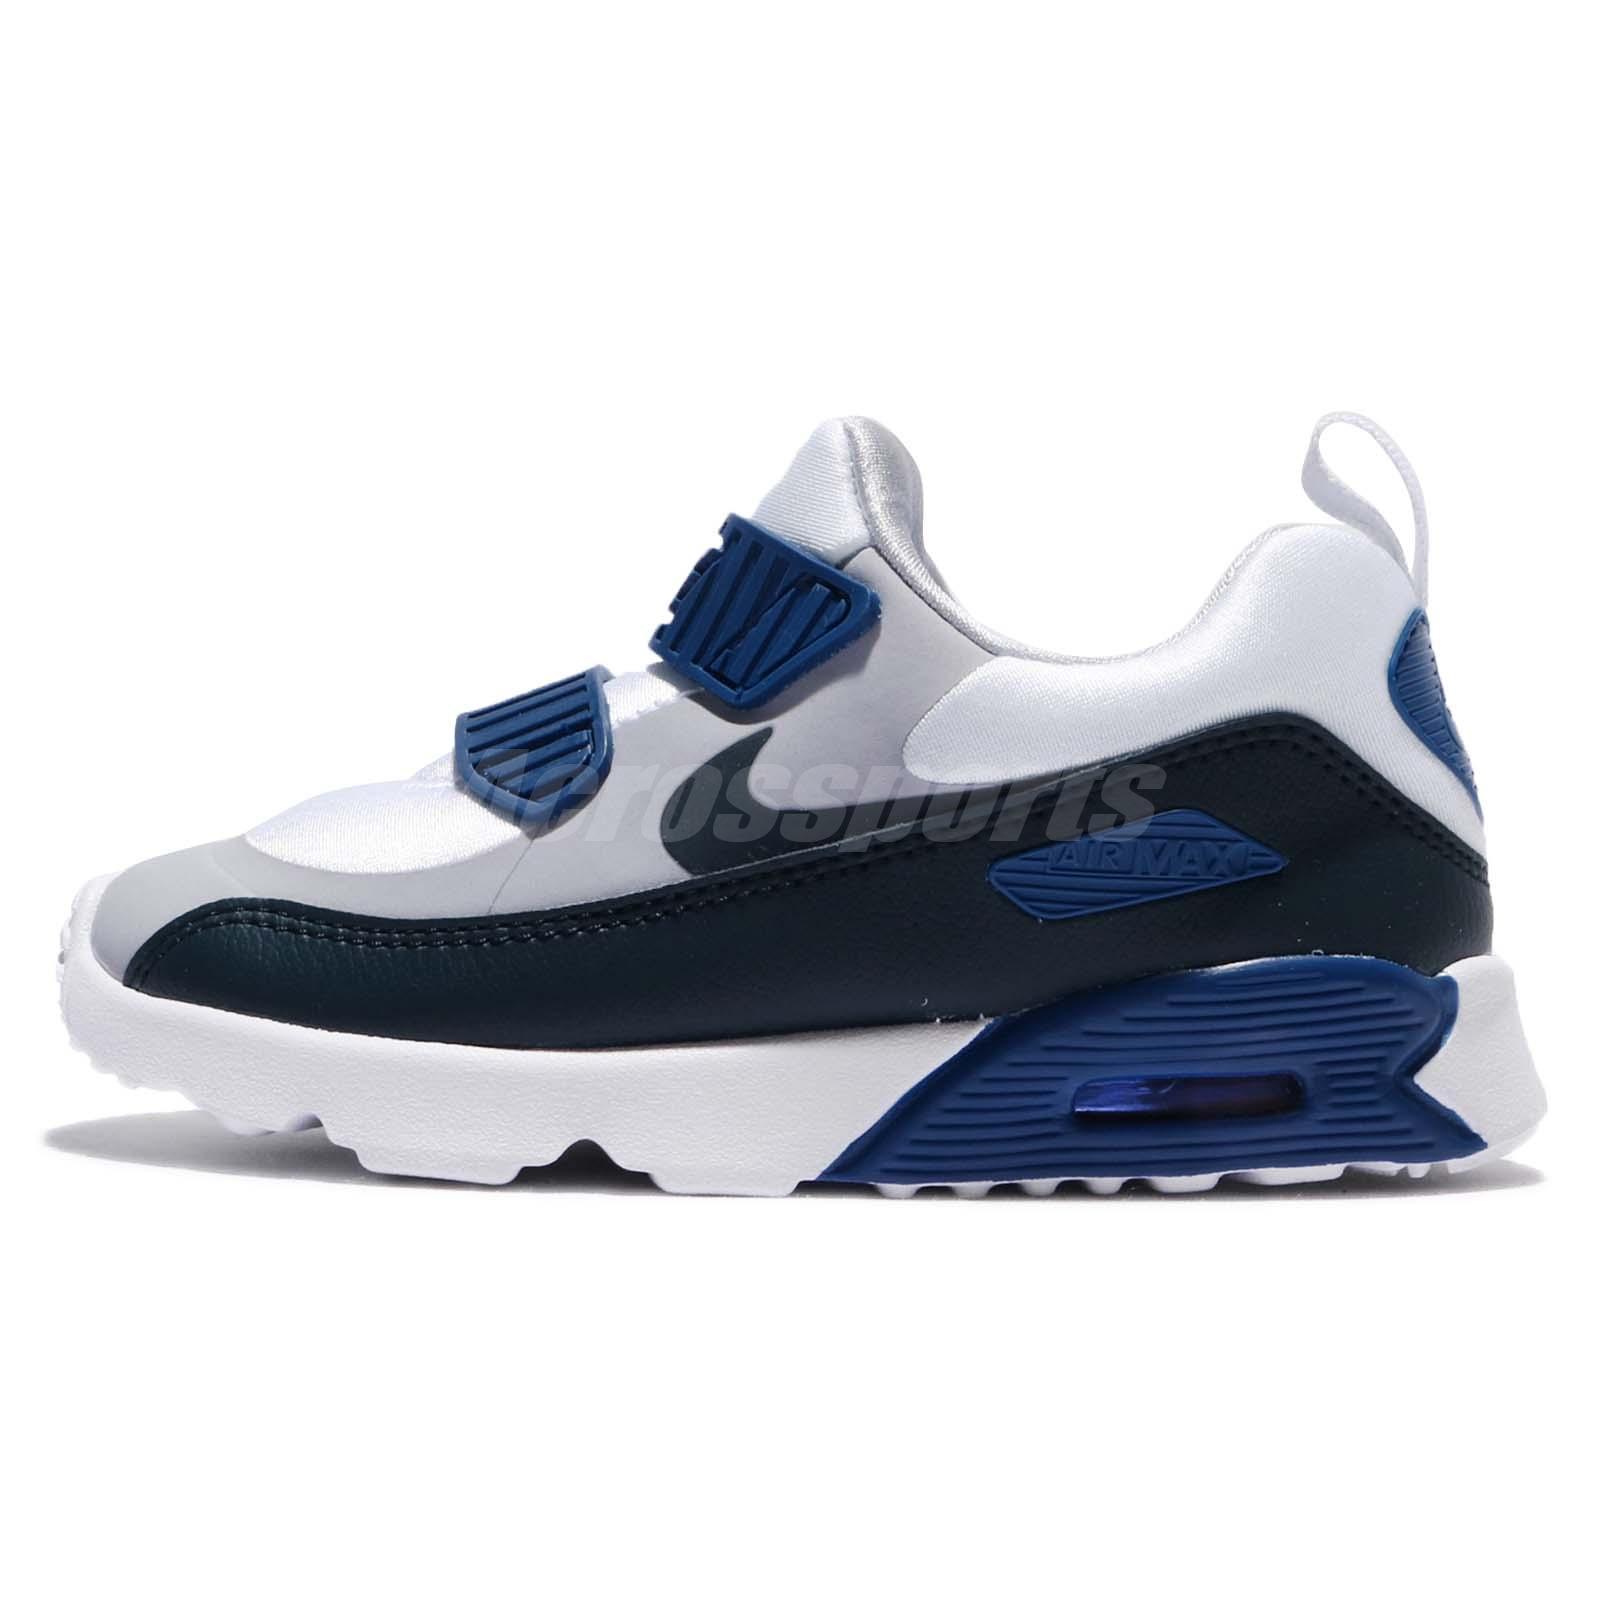 Nike Nike Air Max Tiny 90 TD OG Wolf Grey Navy Toddler Infant Shoes